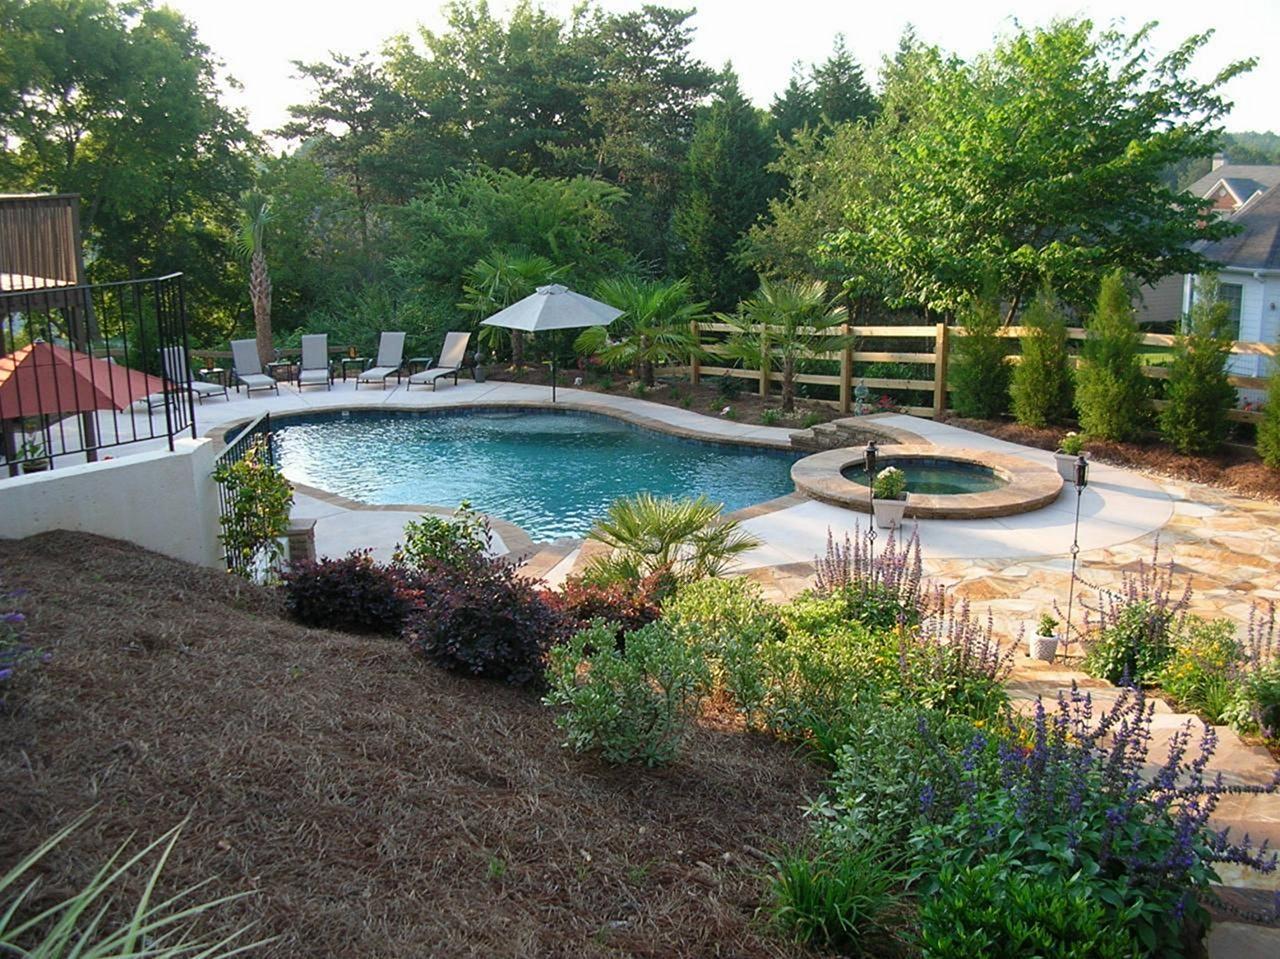 Big Backyard Pool Landscaping Ideas Big Backyard Pool